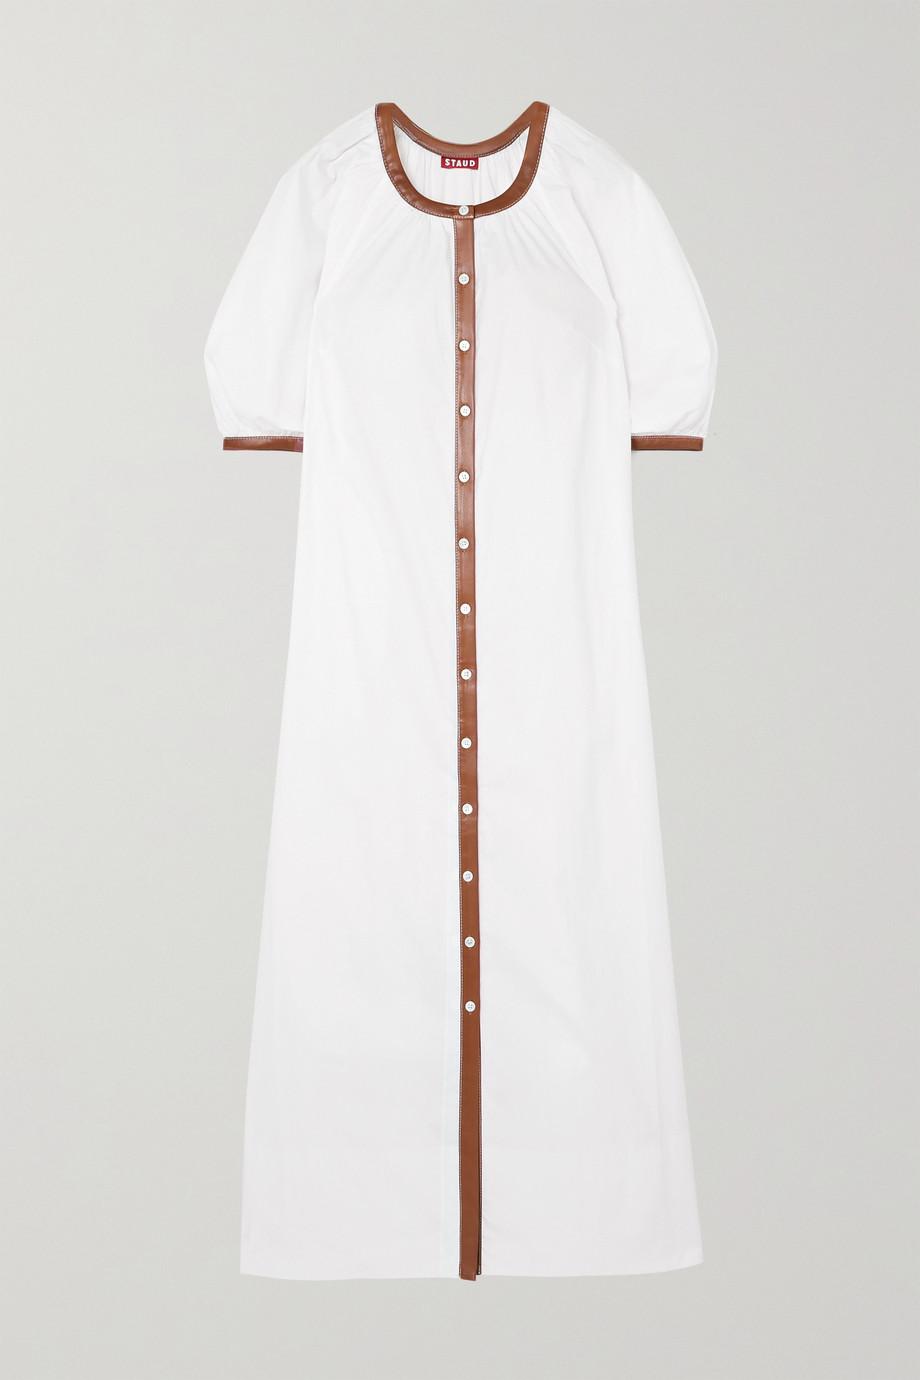 STAUD Vincent vegan leather-trimmed cotton-blend poplin dress